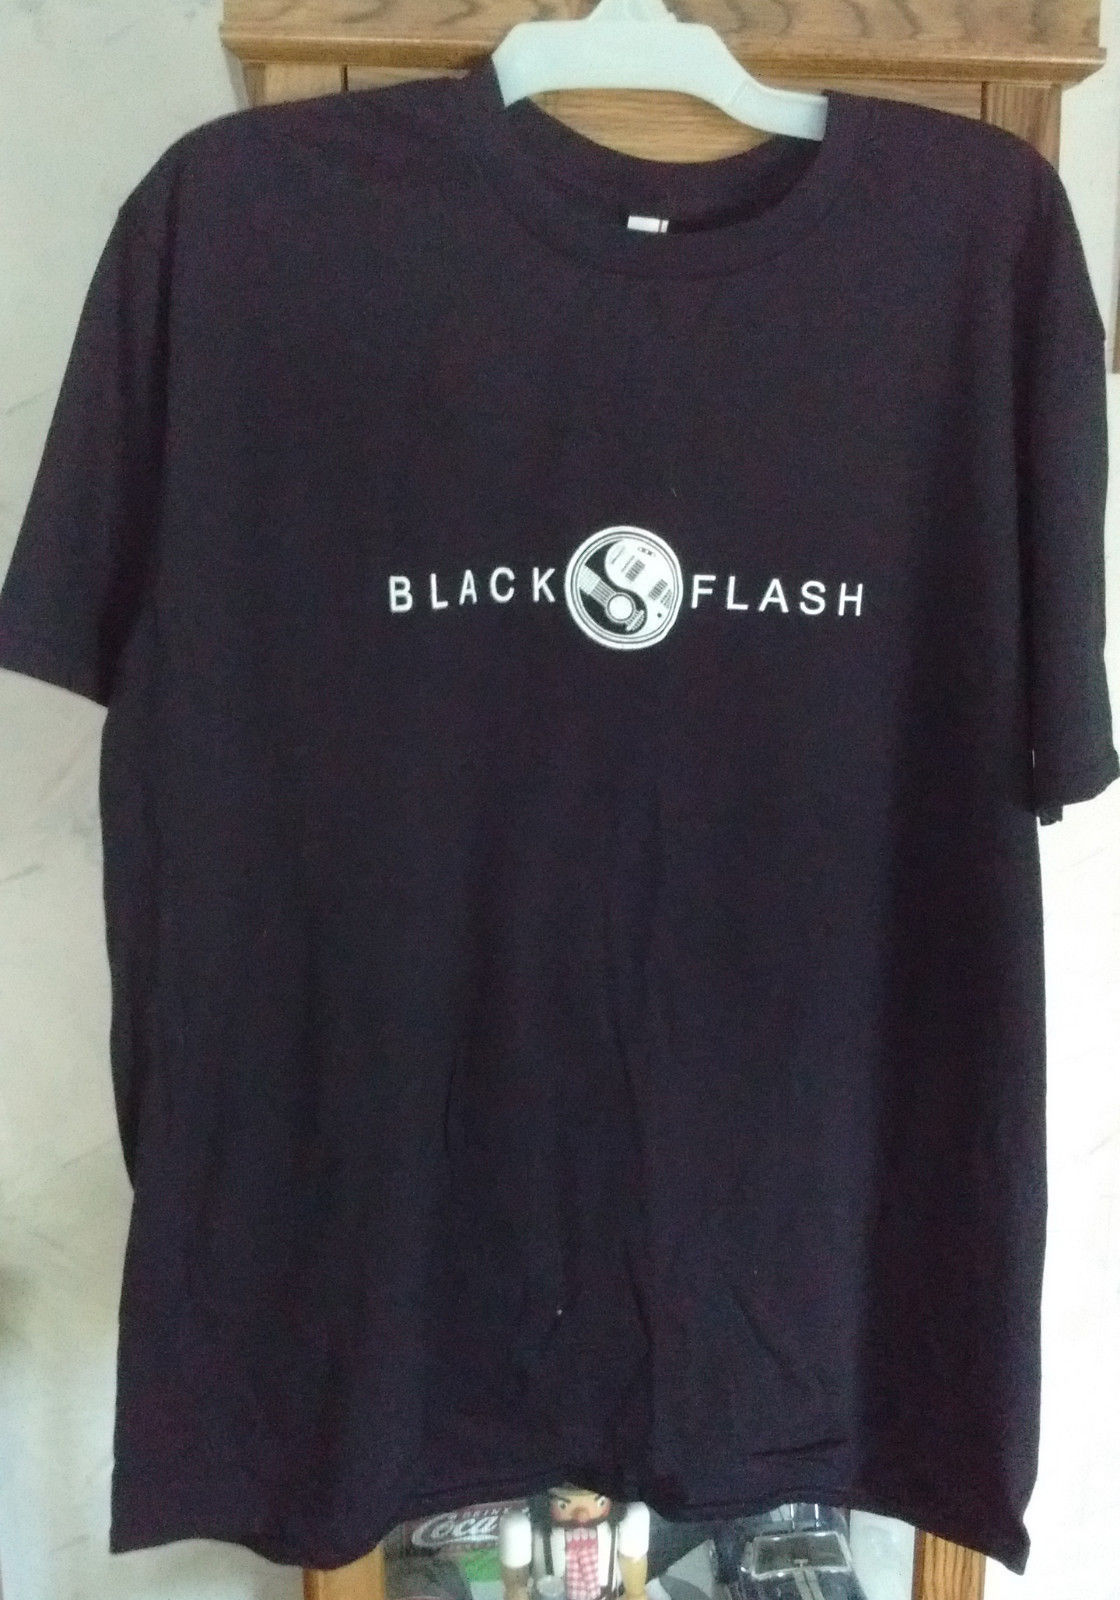 Black Flash CREW T-Shirt XL by Anvil